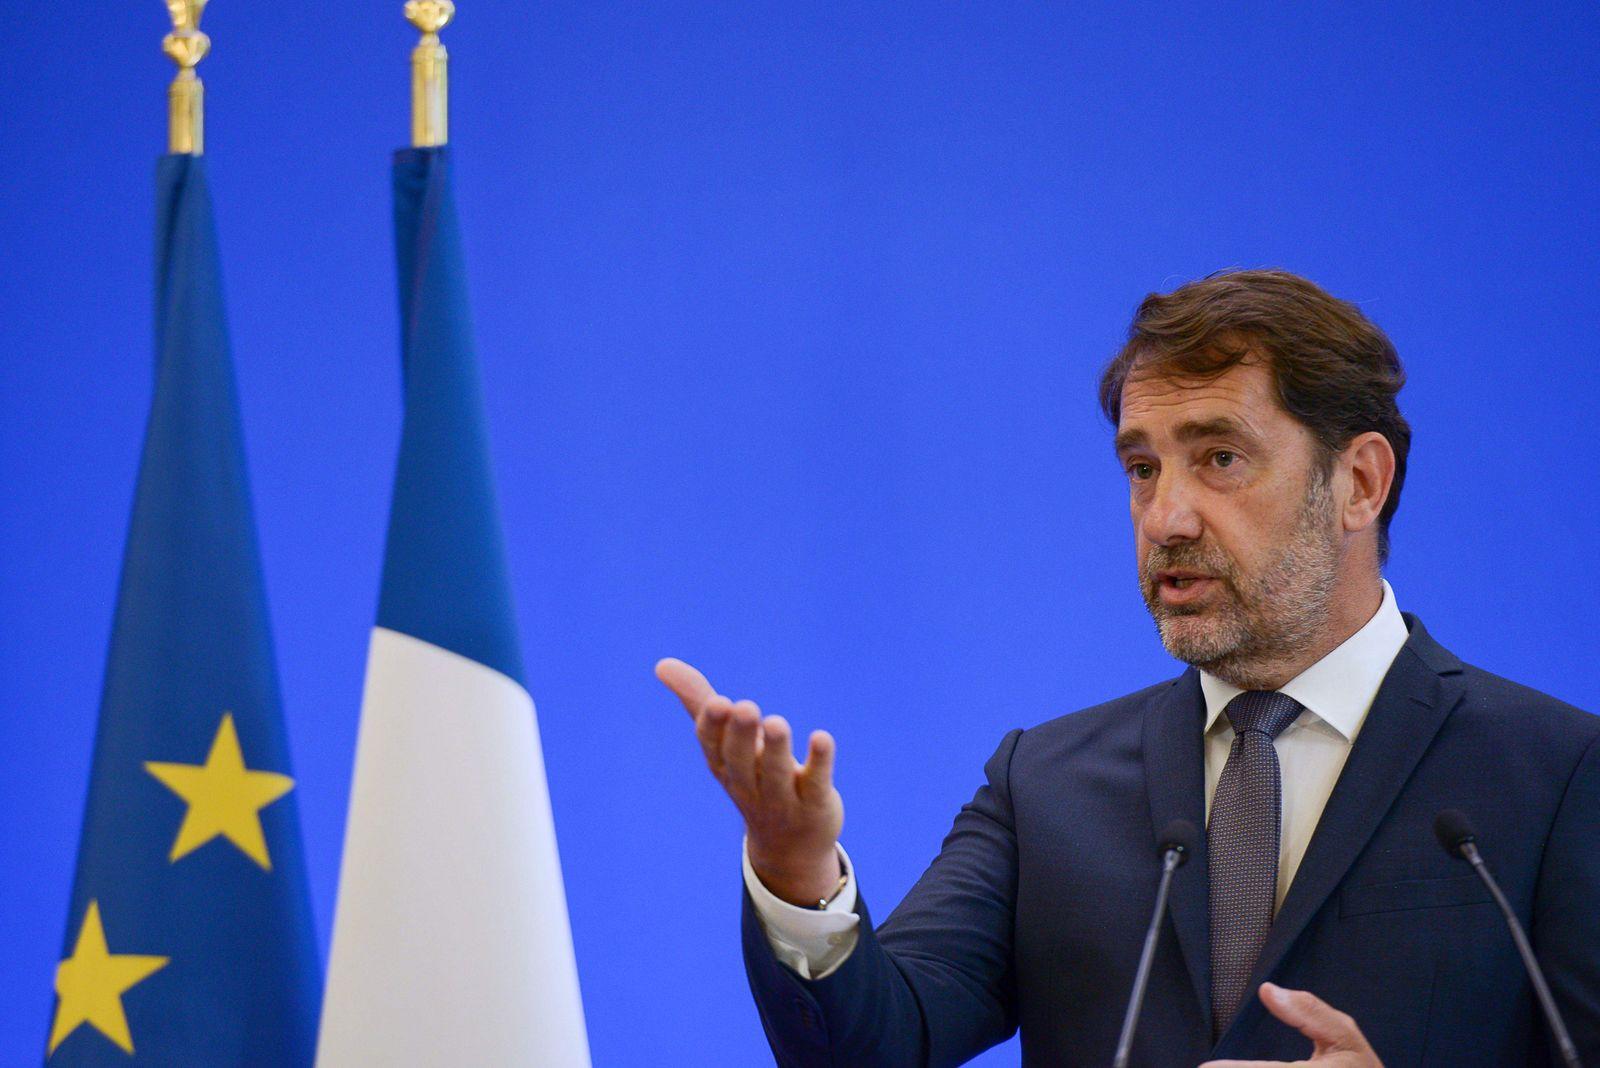 FRANCE-POLITICS-POLICE-RACISM